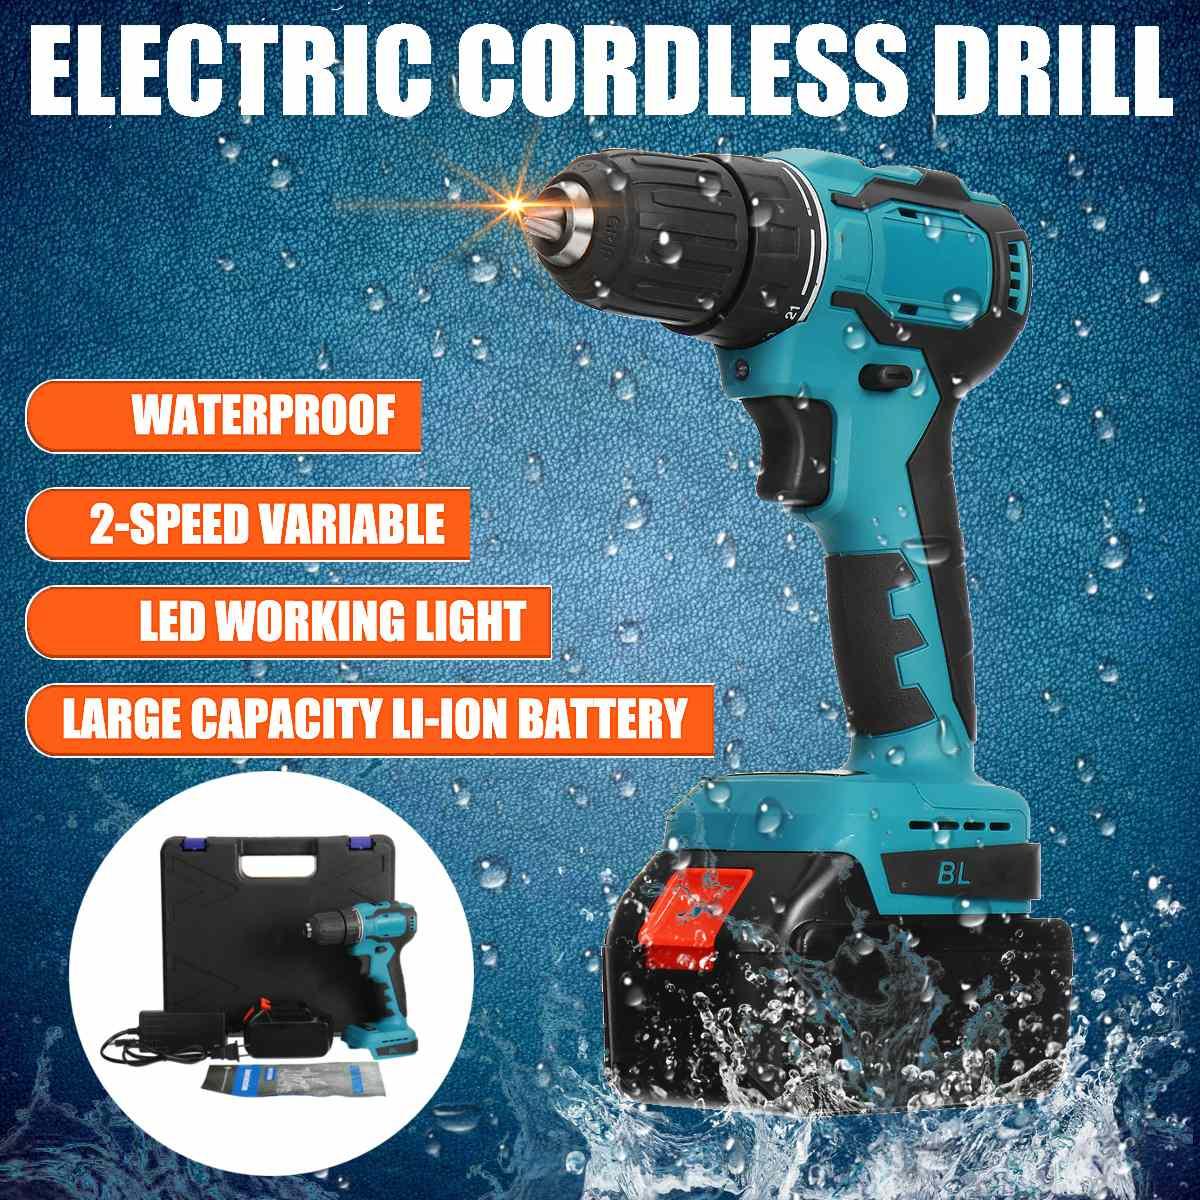 48V Cordless Electric Impact Drill 150Nm Torque Driver Kit Screwdriver Brushless LED Power Tools 6500mAh Battery